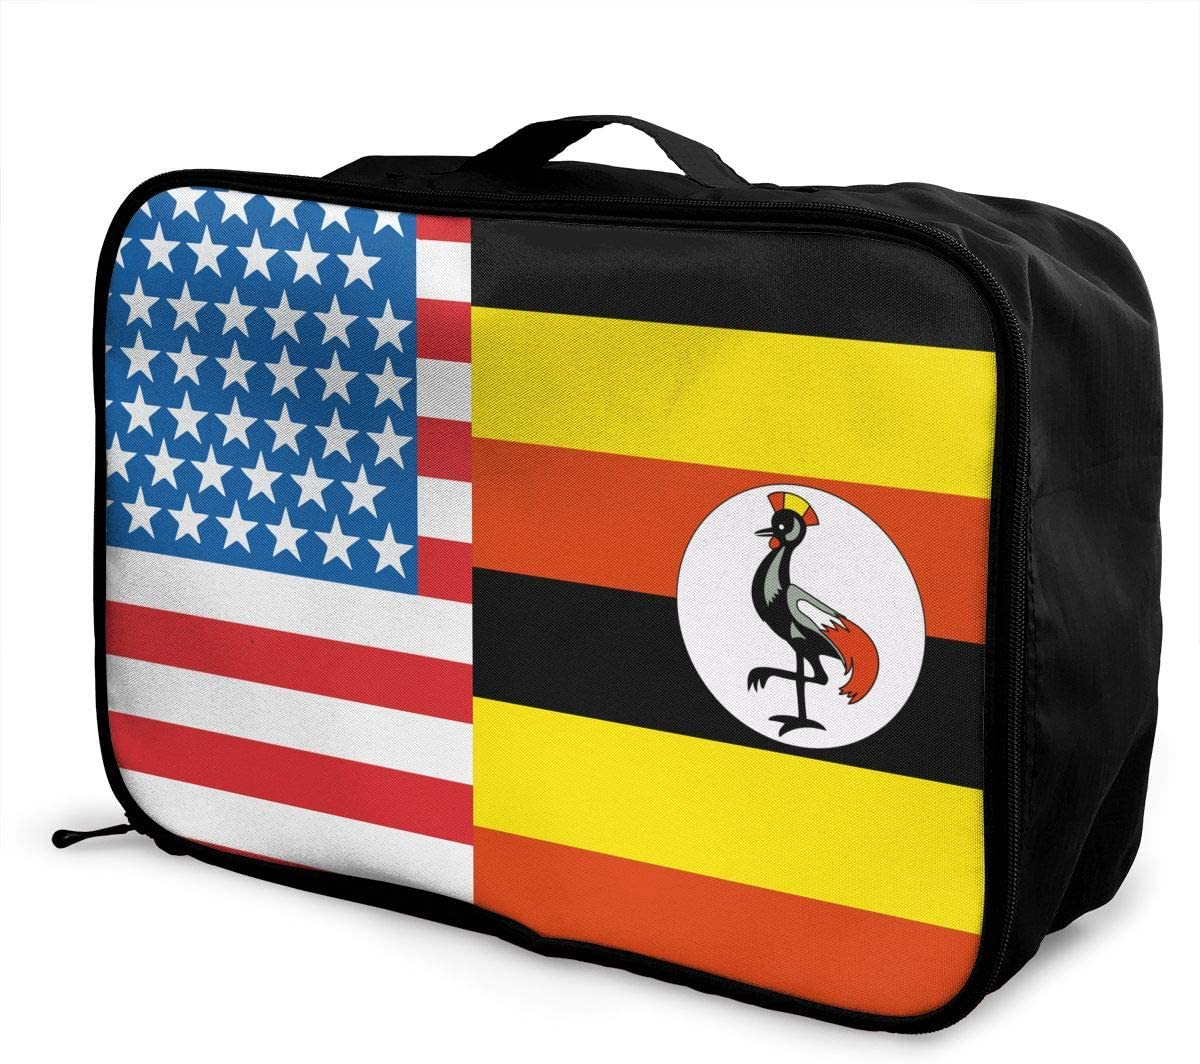 American Uganda Flag Overnight Carry On Luggage Waterproof Fashion Travel Bag Lightweight Suitcases